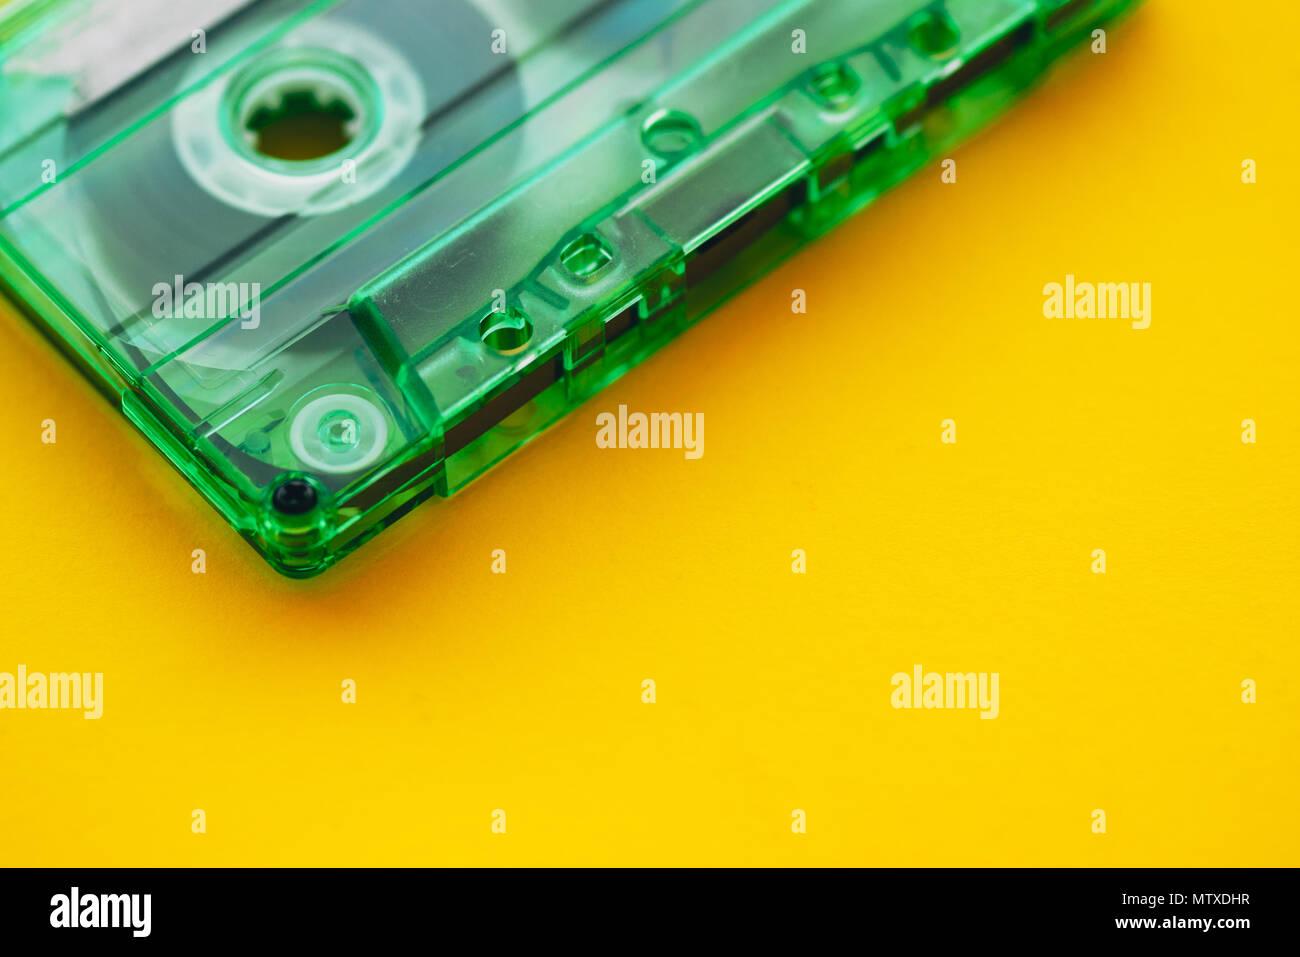 Audio cassette tape on yellow background, retro vintage technology - Stock Image